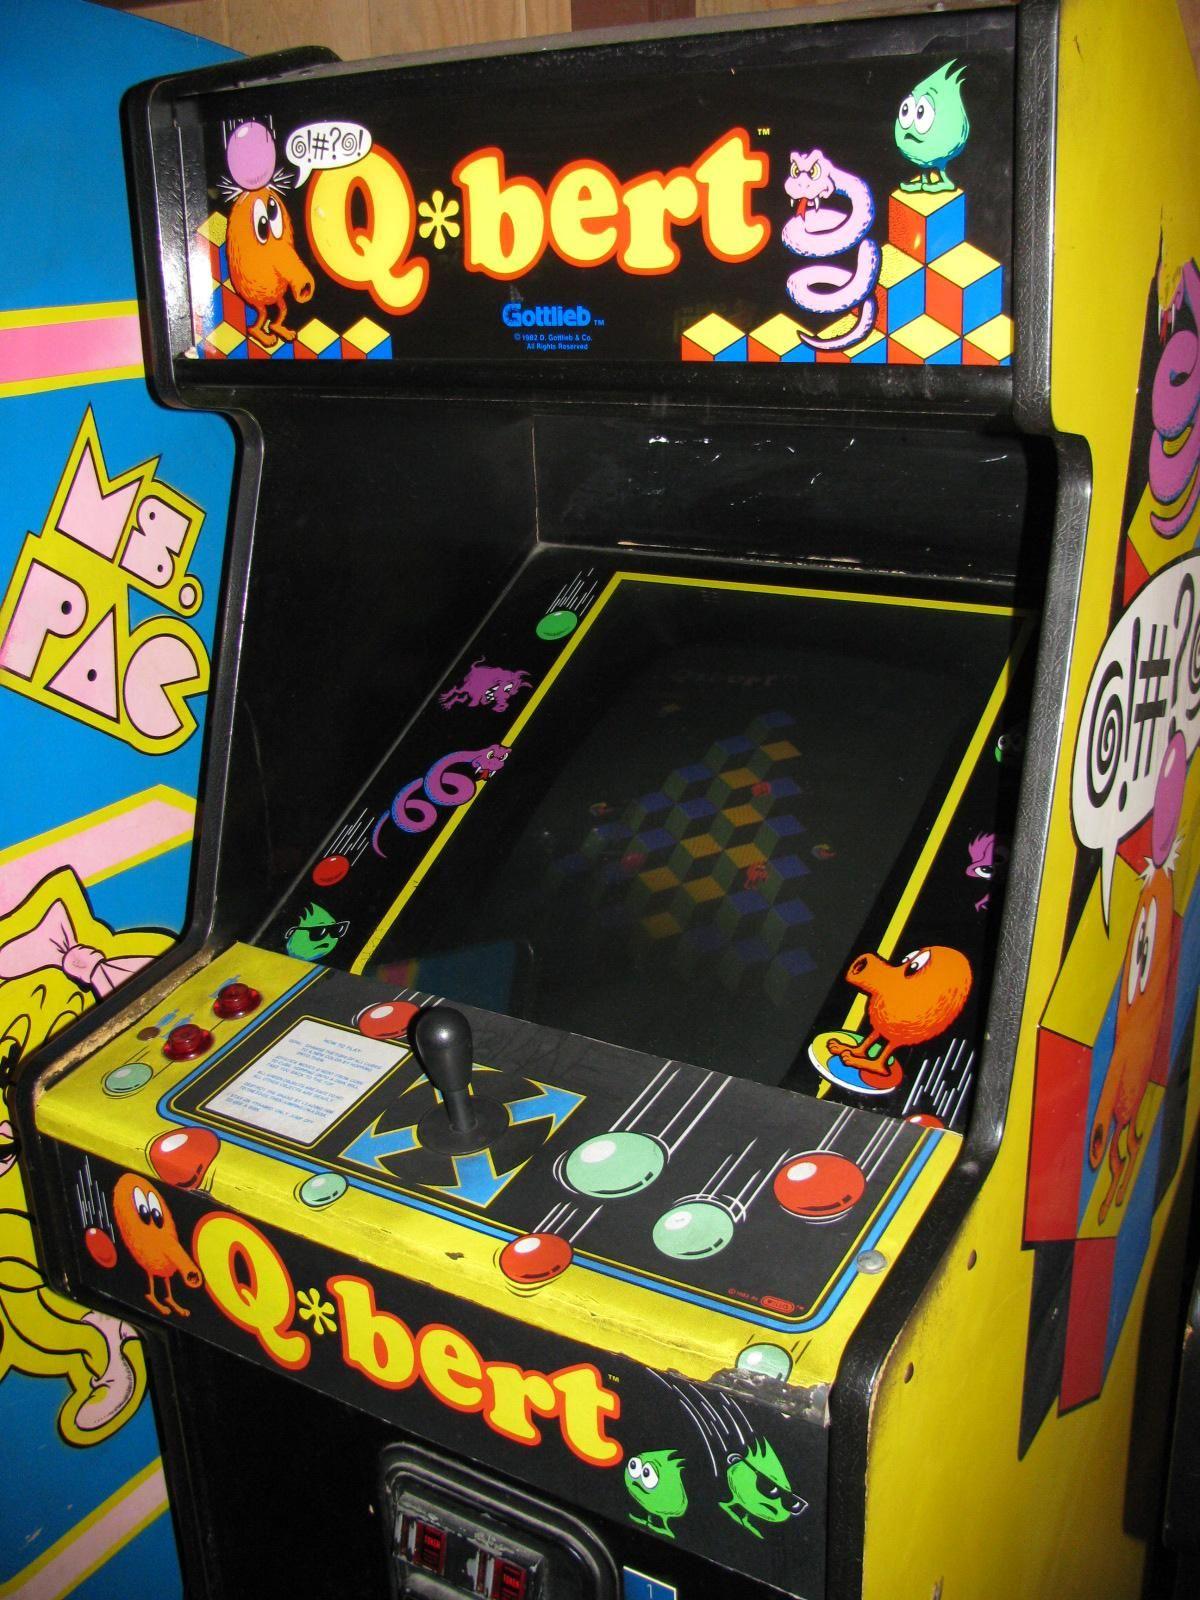 Q*bert.. I own a computer game of it. Old school arcade